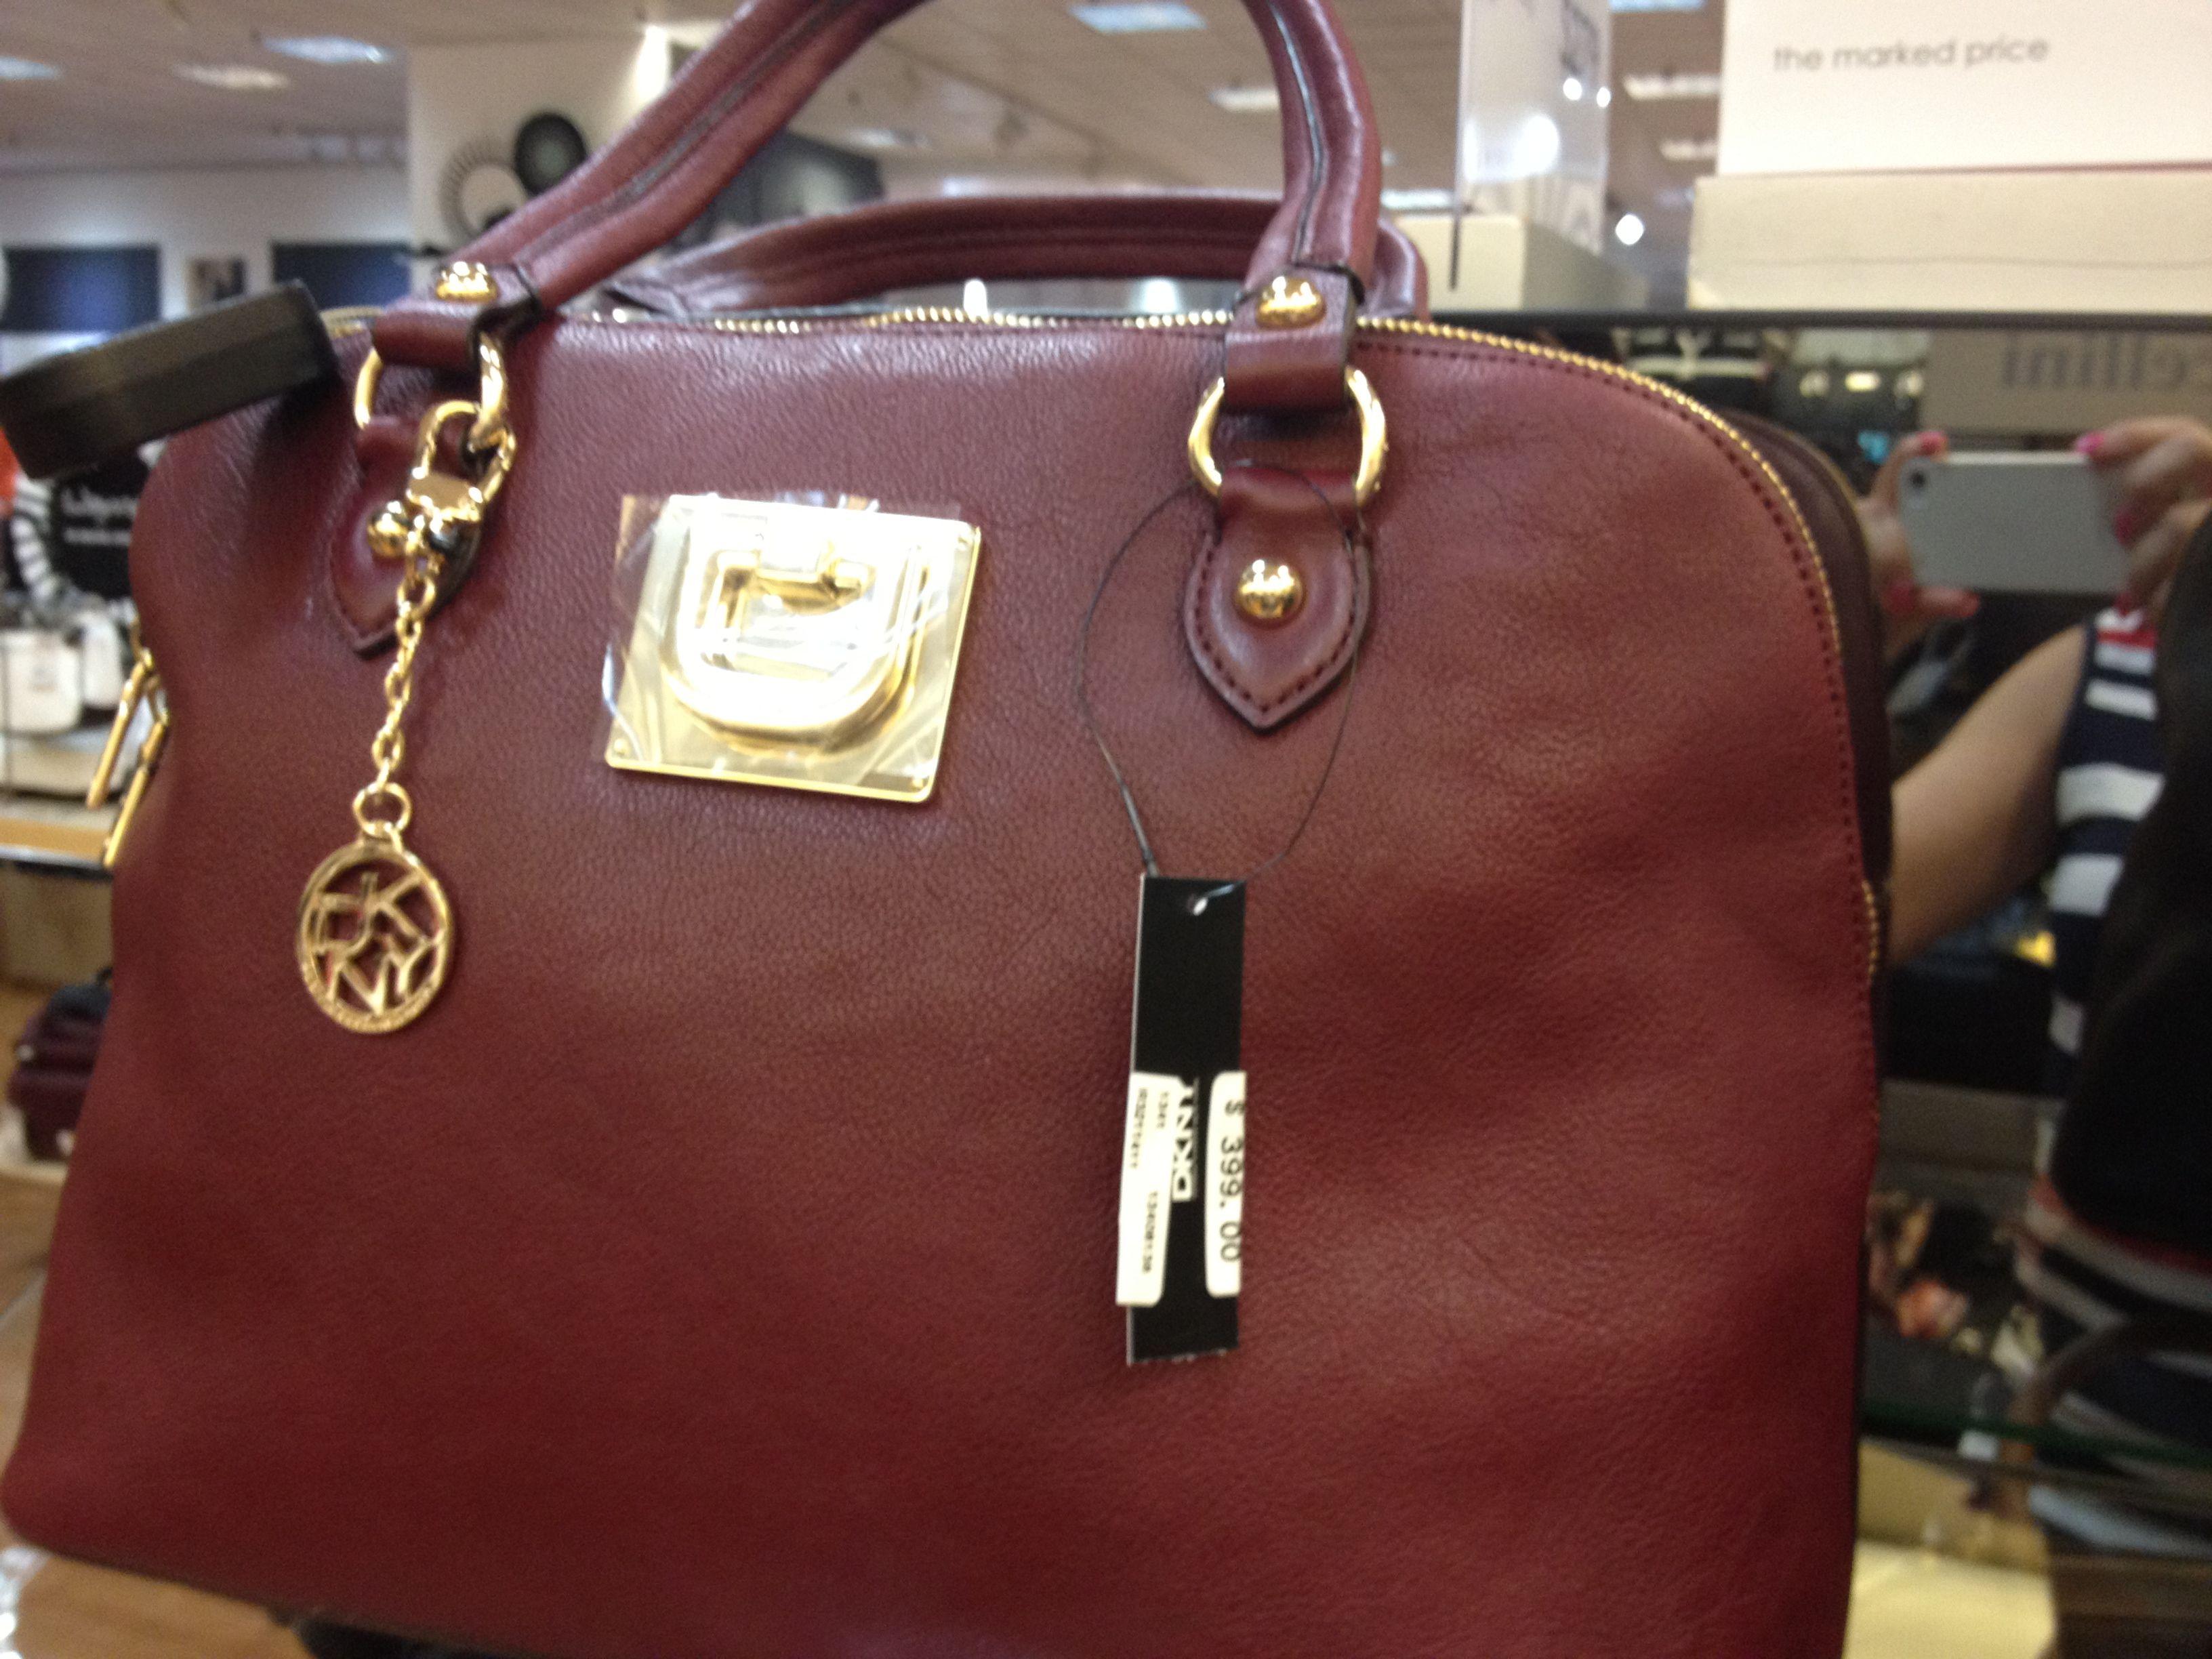 Jenny David Jones Dkny Tote Bag 399